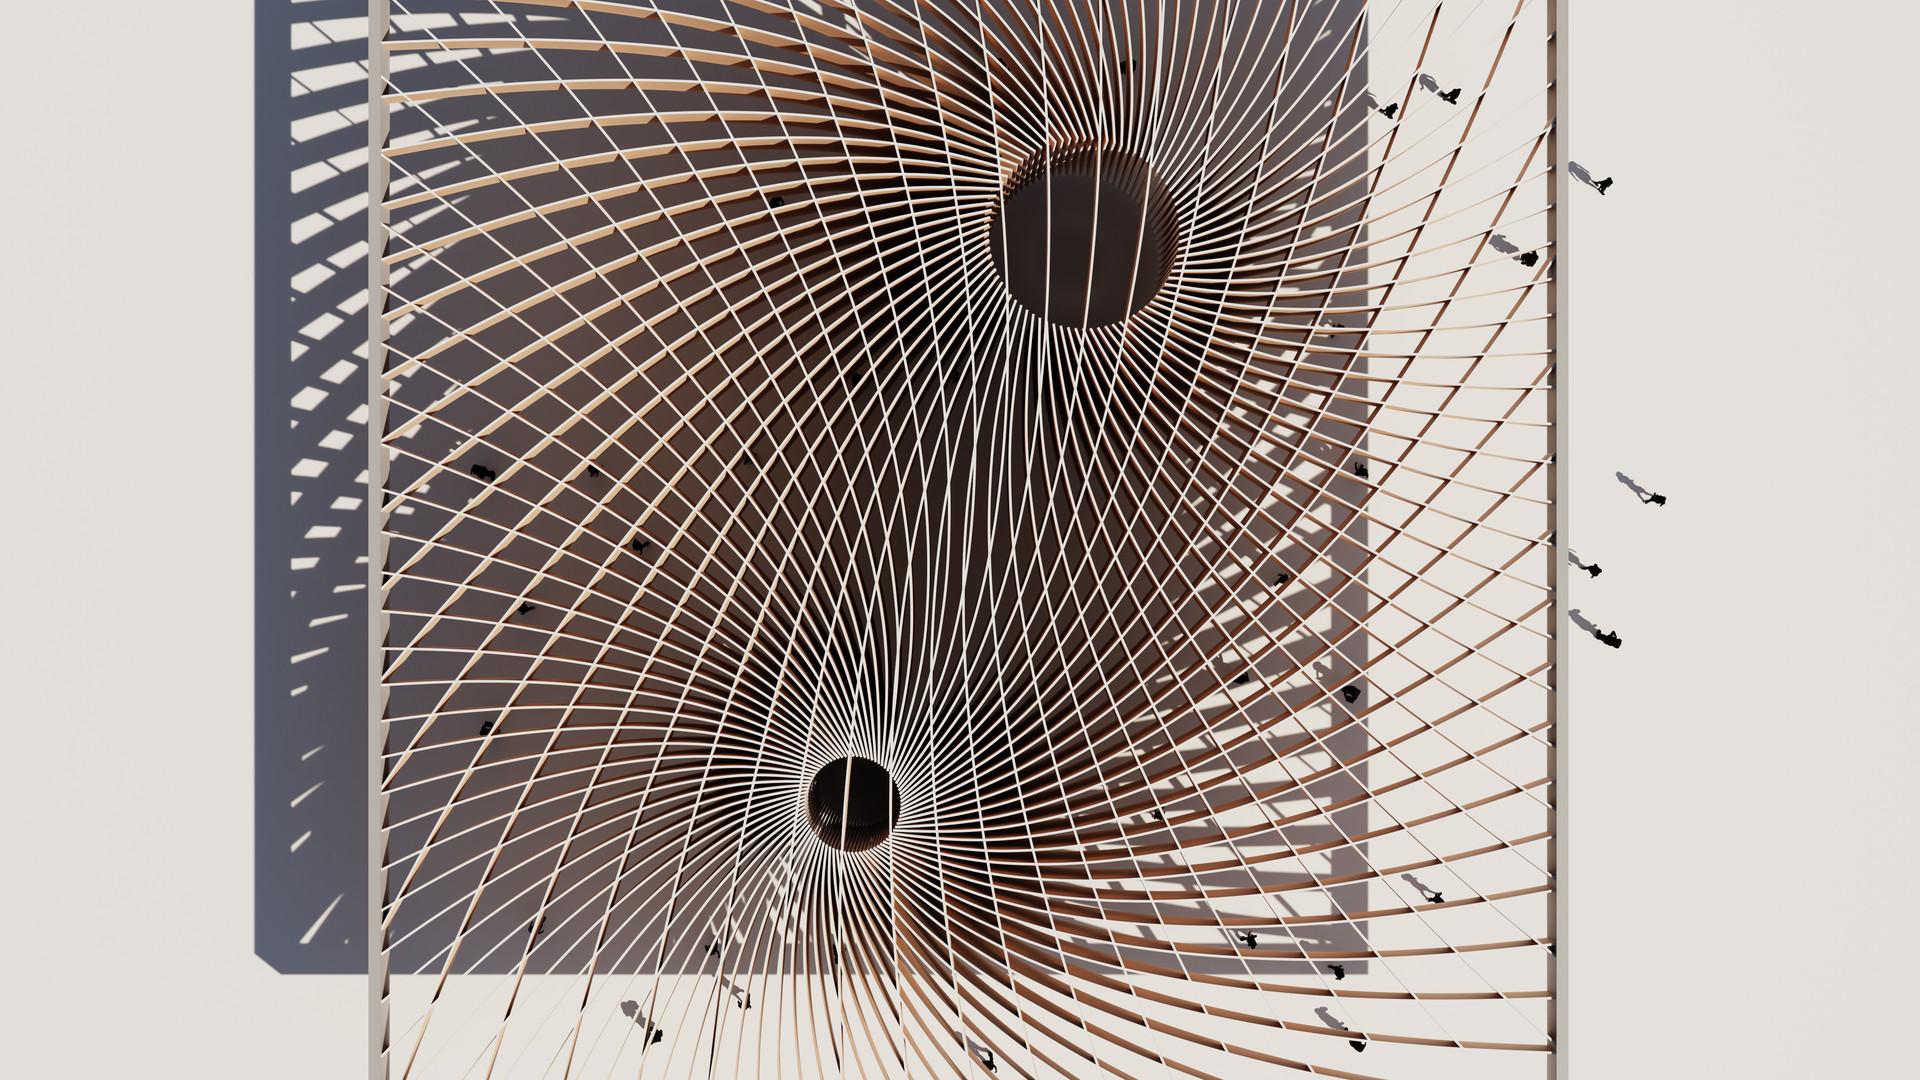 Spiral Waffle Pavilion